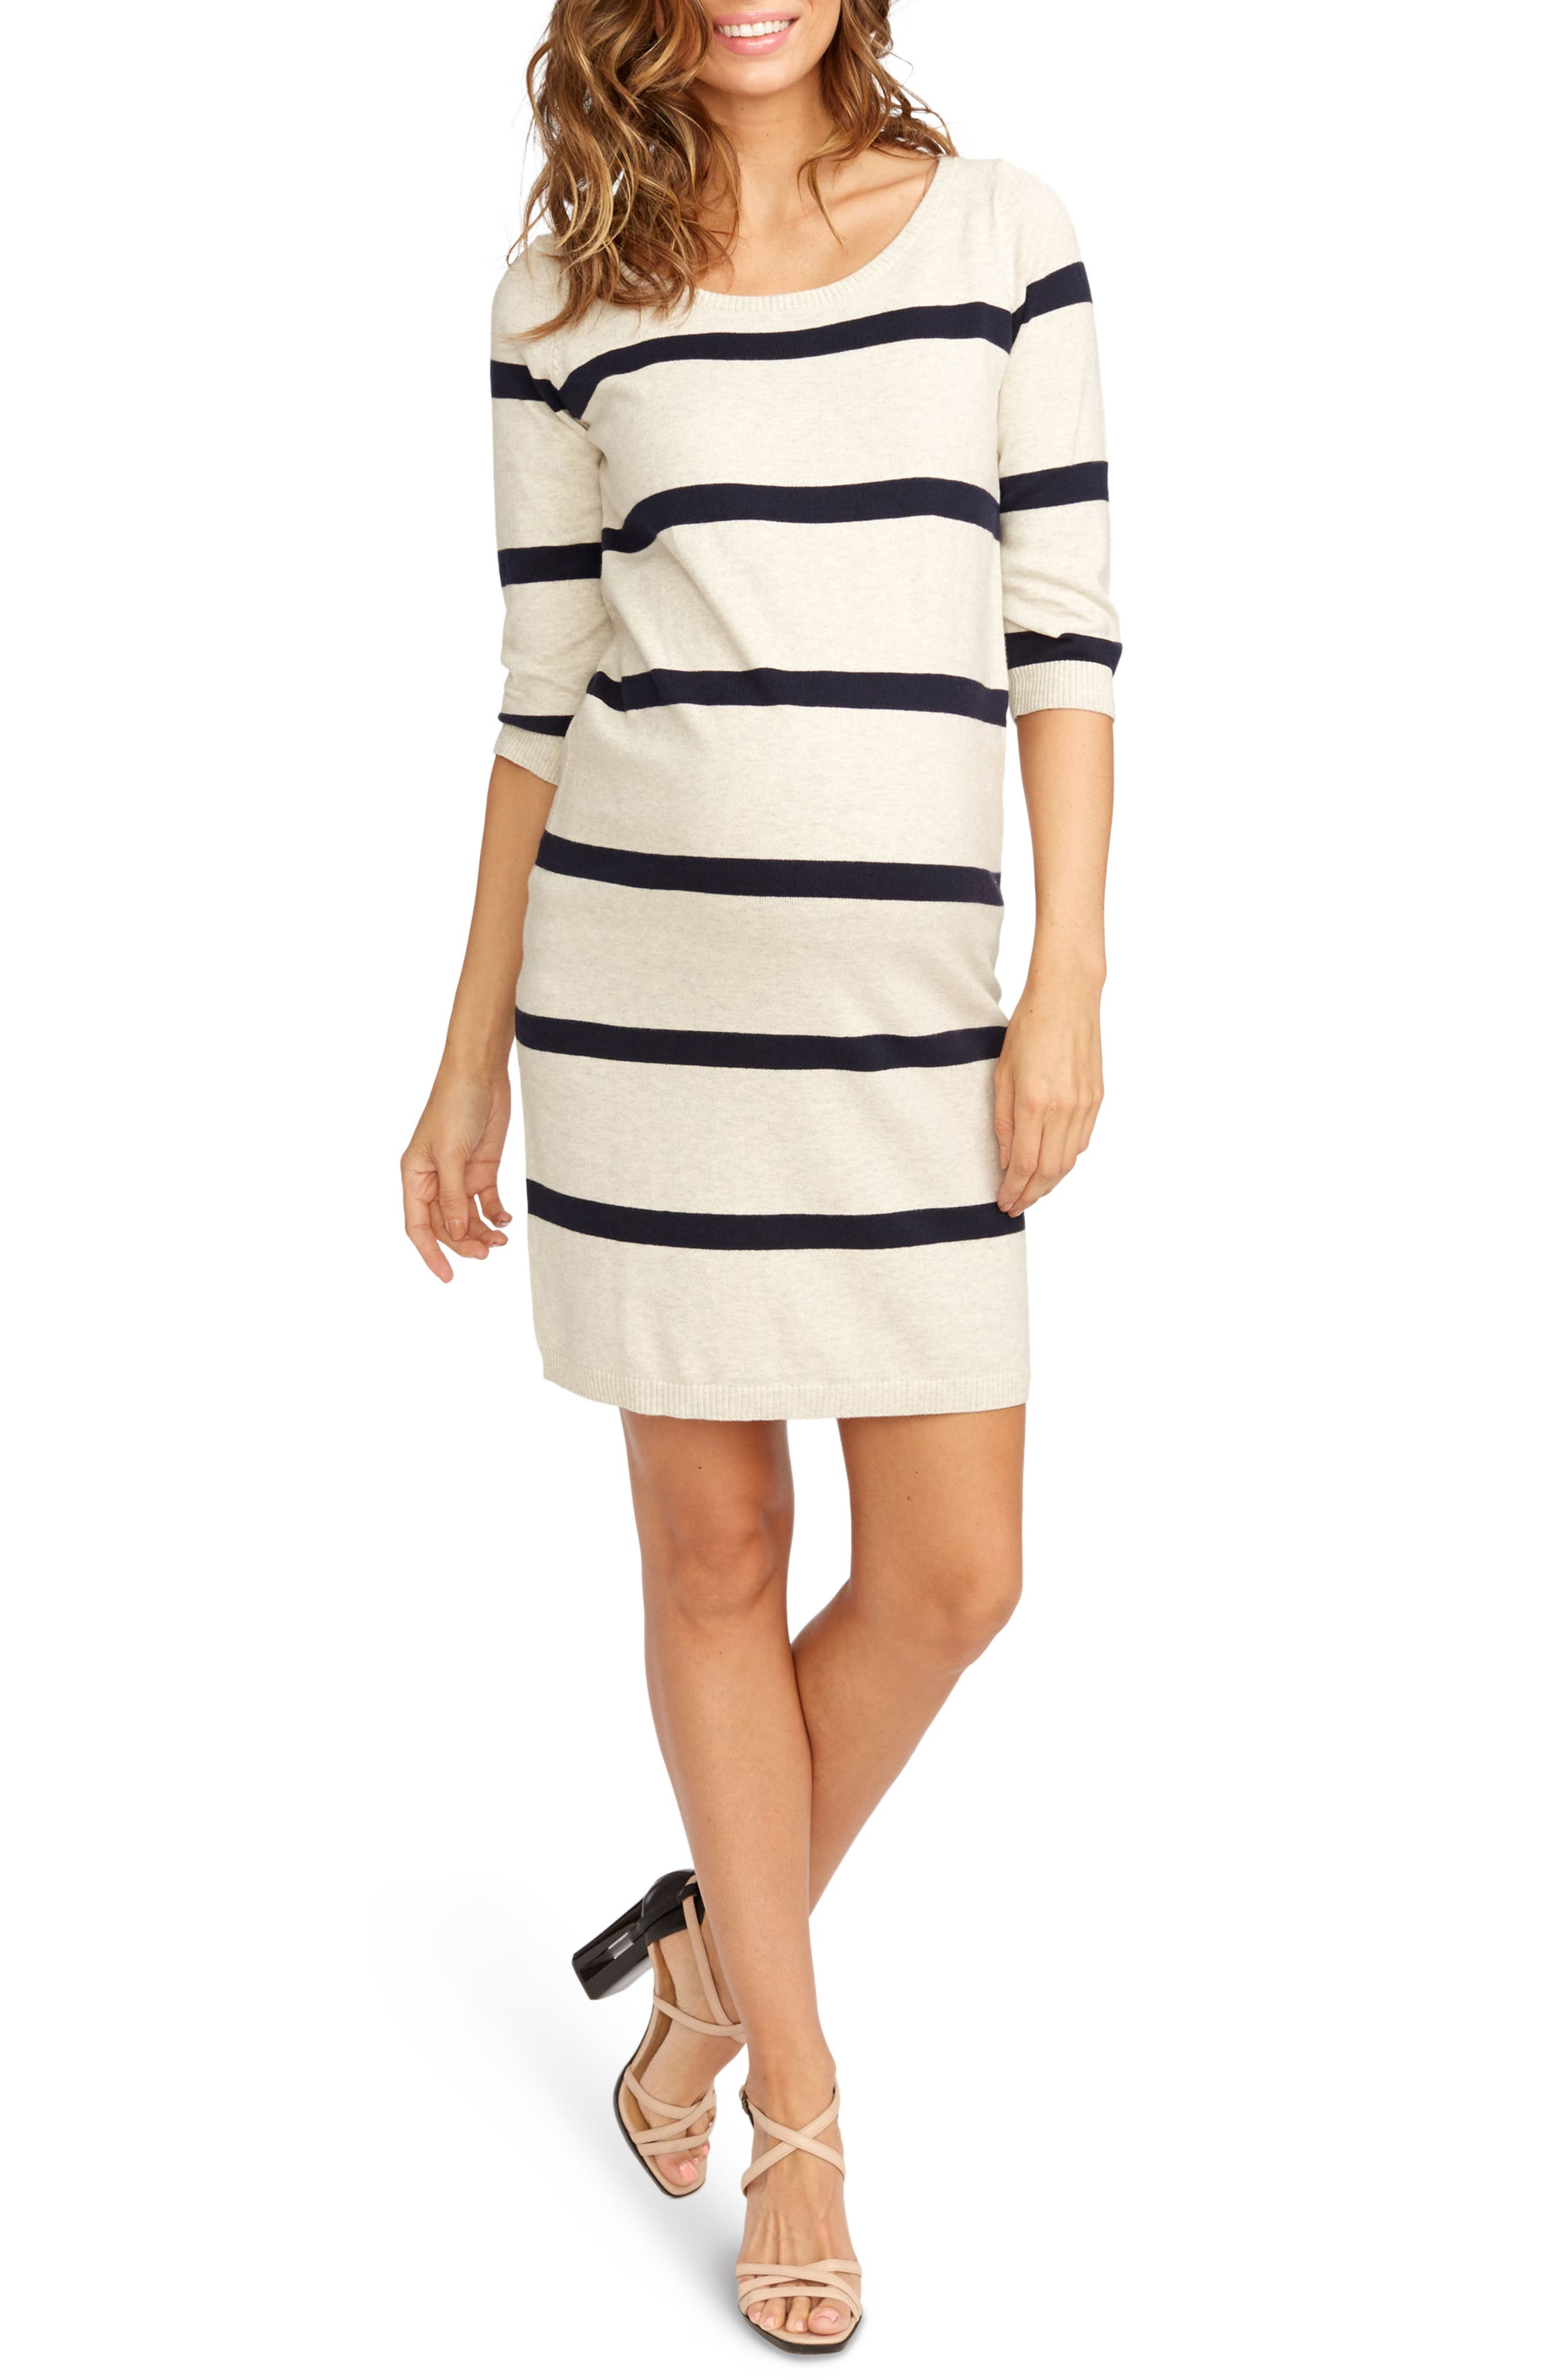 Rosie Pope 'Harper' Stripe Maternity Sweater Dress